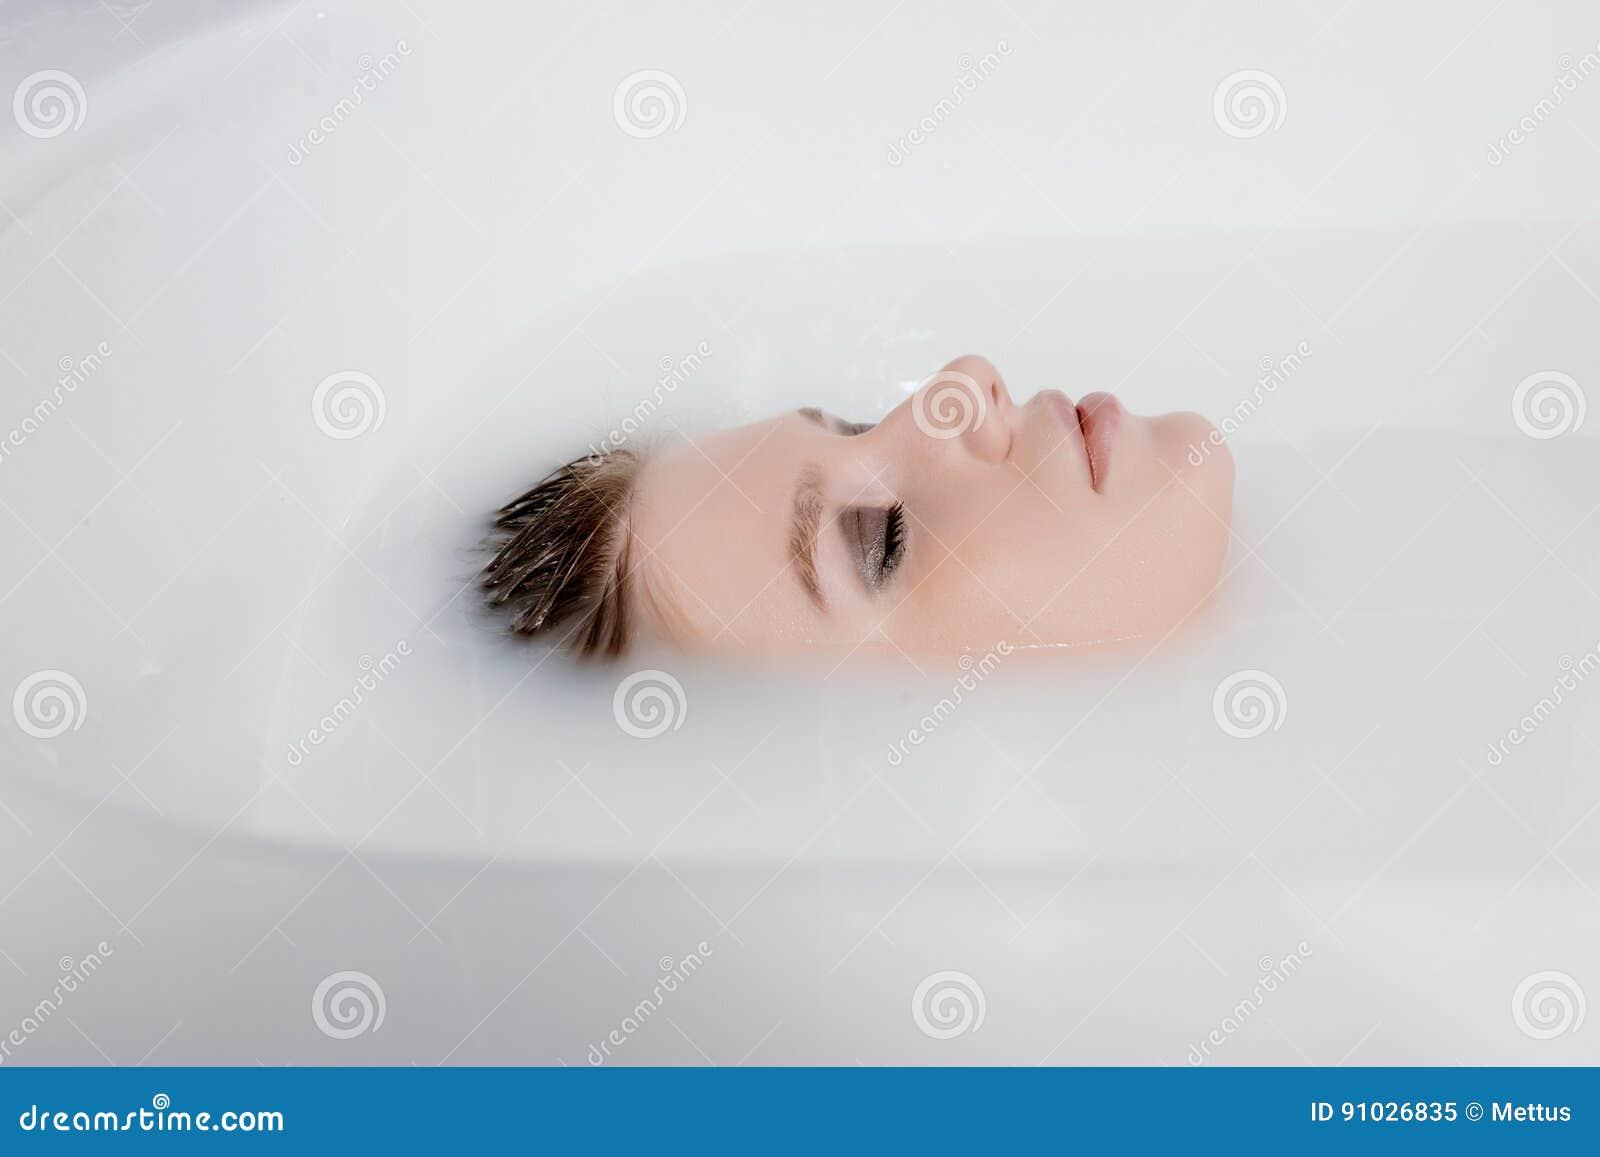 Женщина брызгает молоко фото 459-149